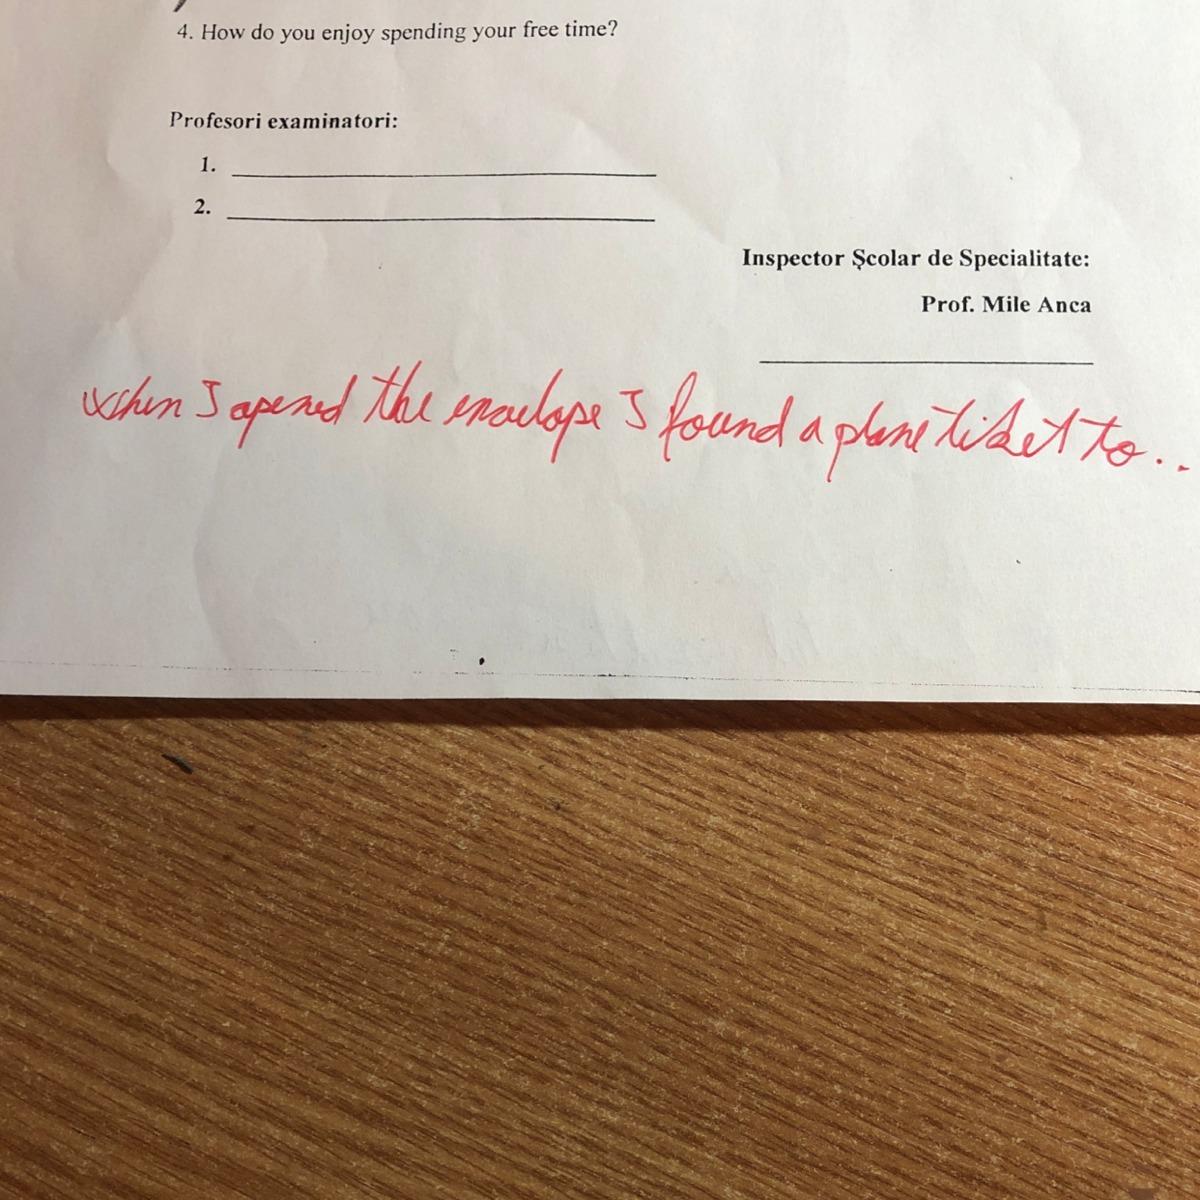 Compunere in engleza brainly